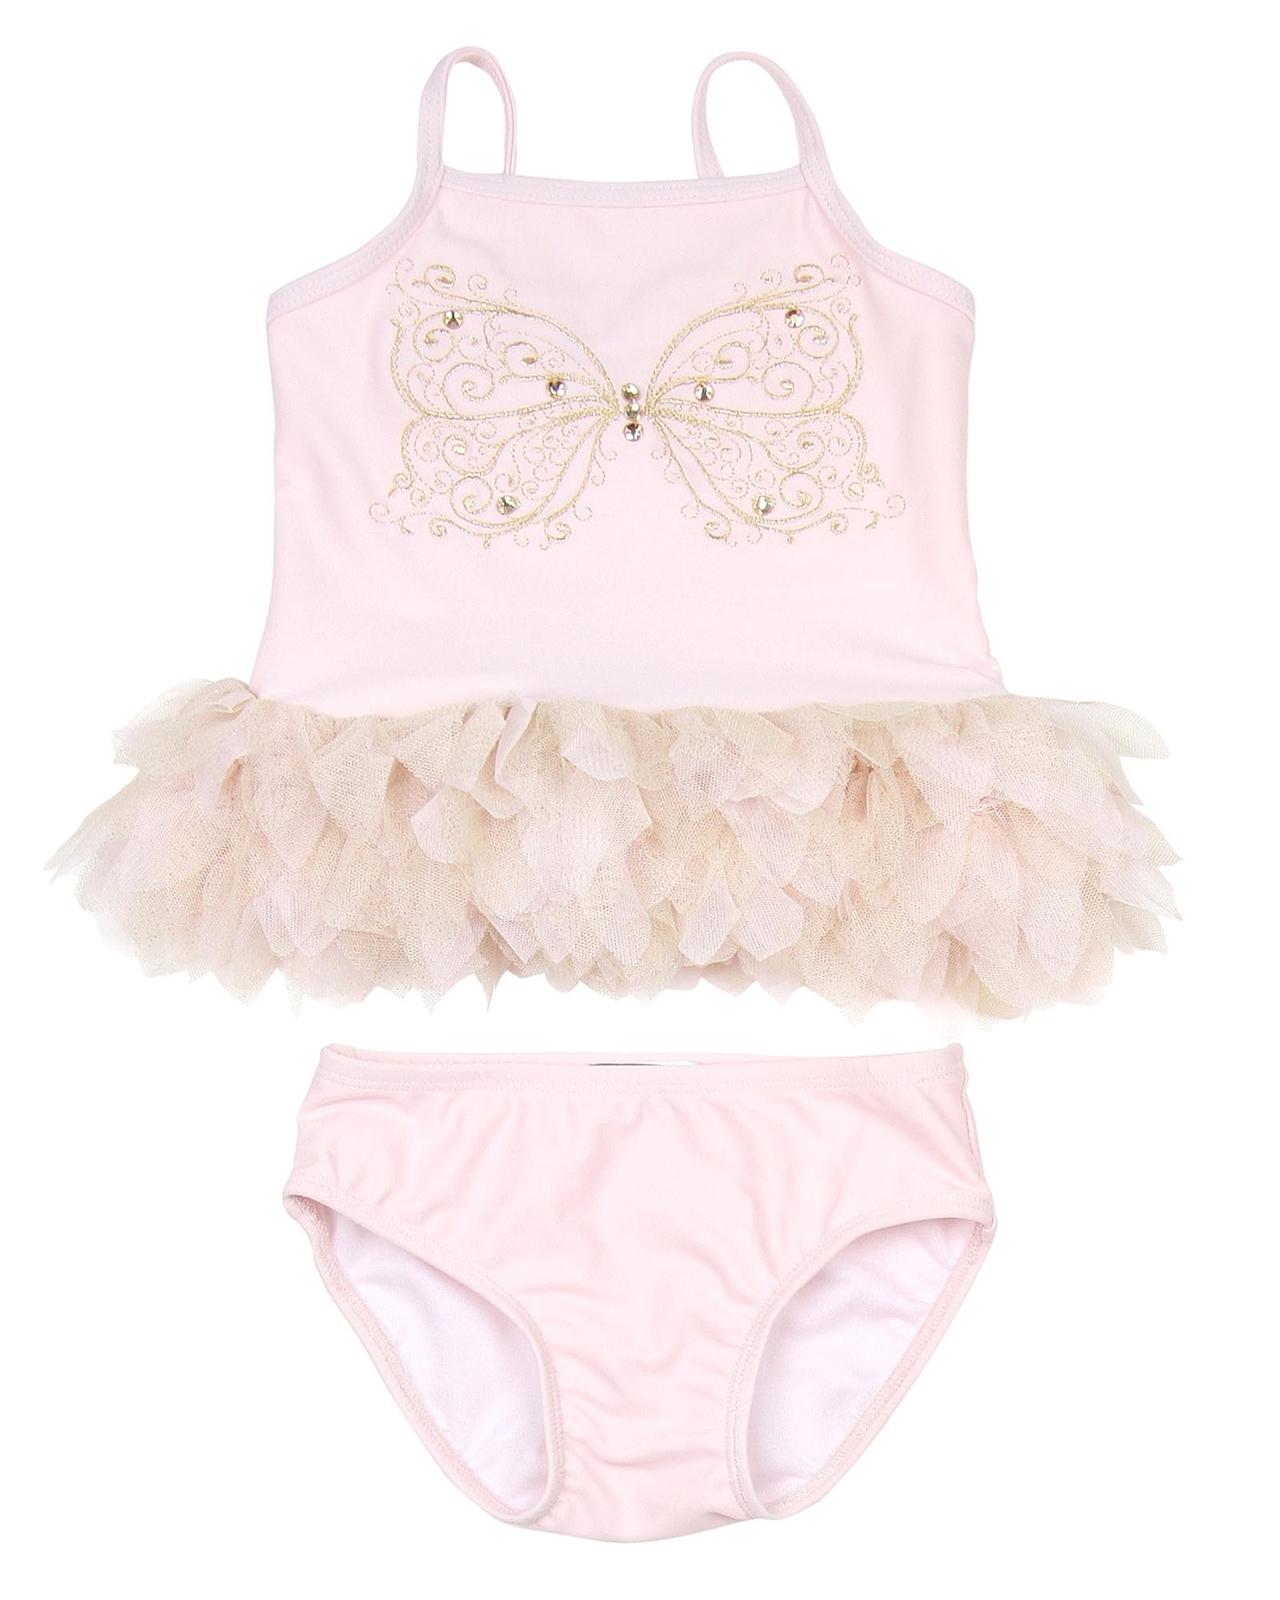 Sizes 4-10 Kate Mack Girls Princess Party Bikini with Frills